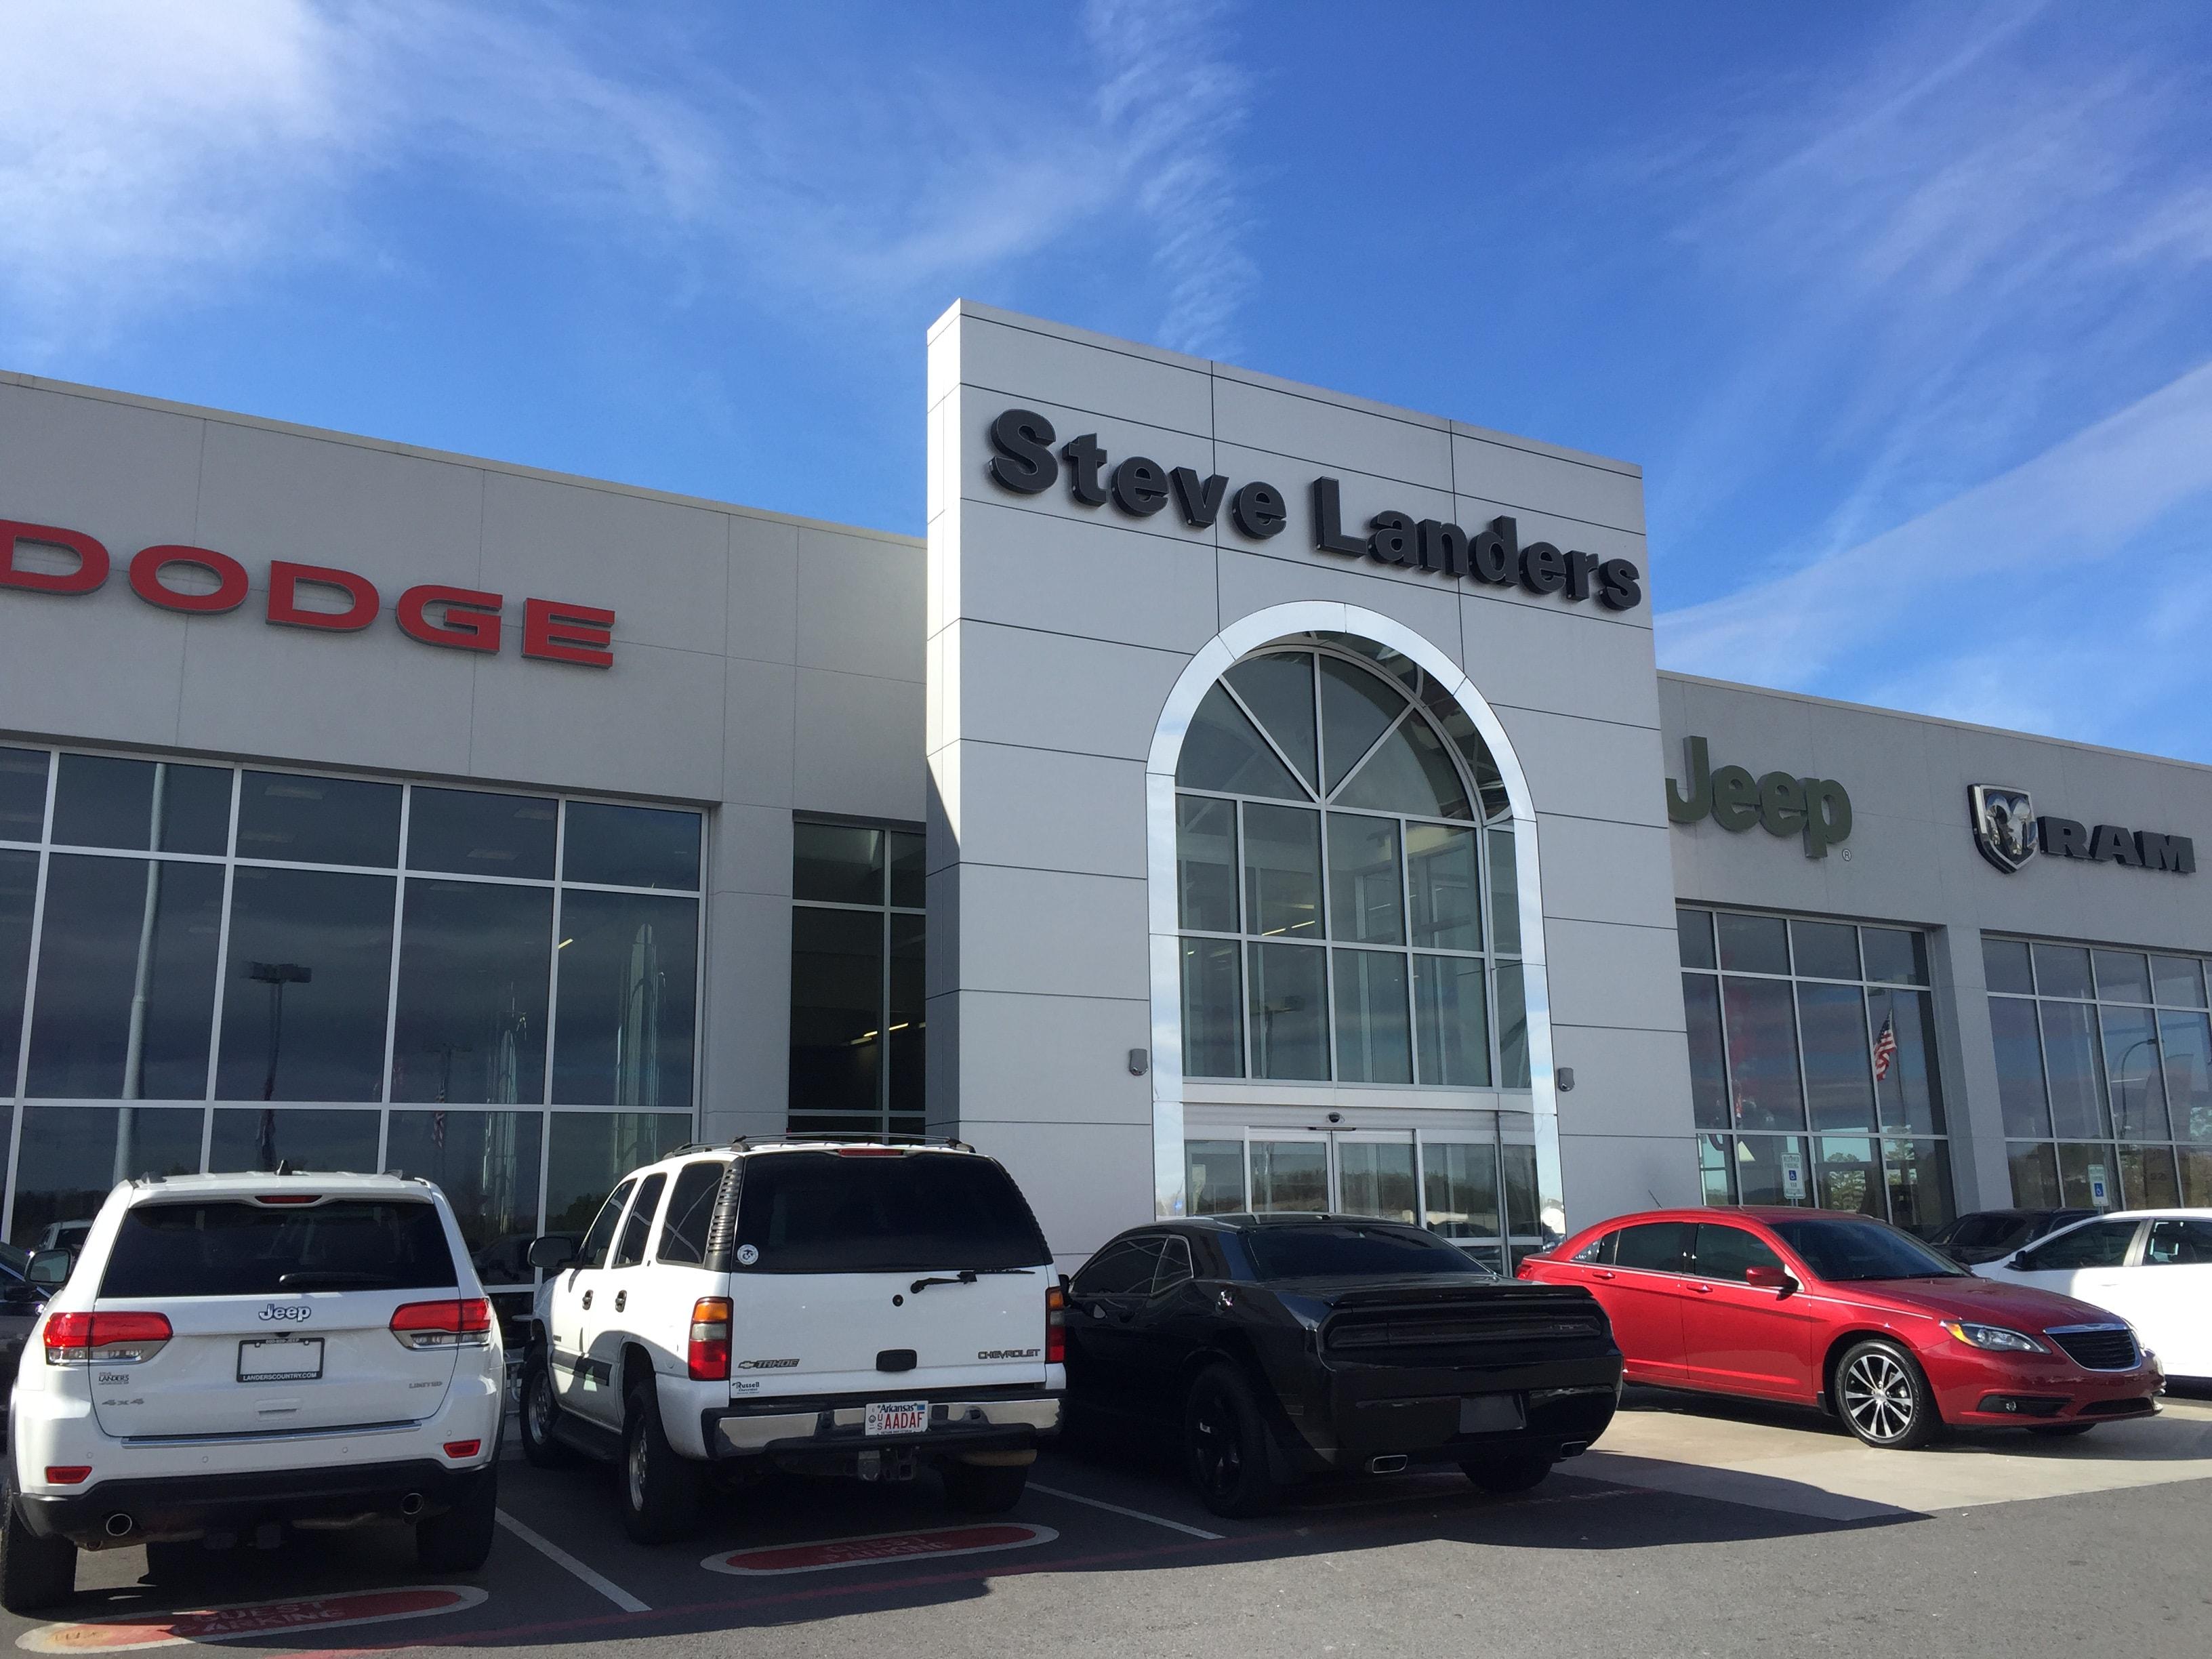 News Blog Post List Steve Landers Chrysler Dodge Jeep